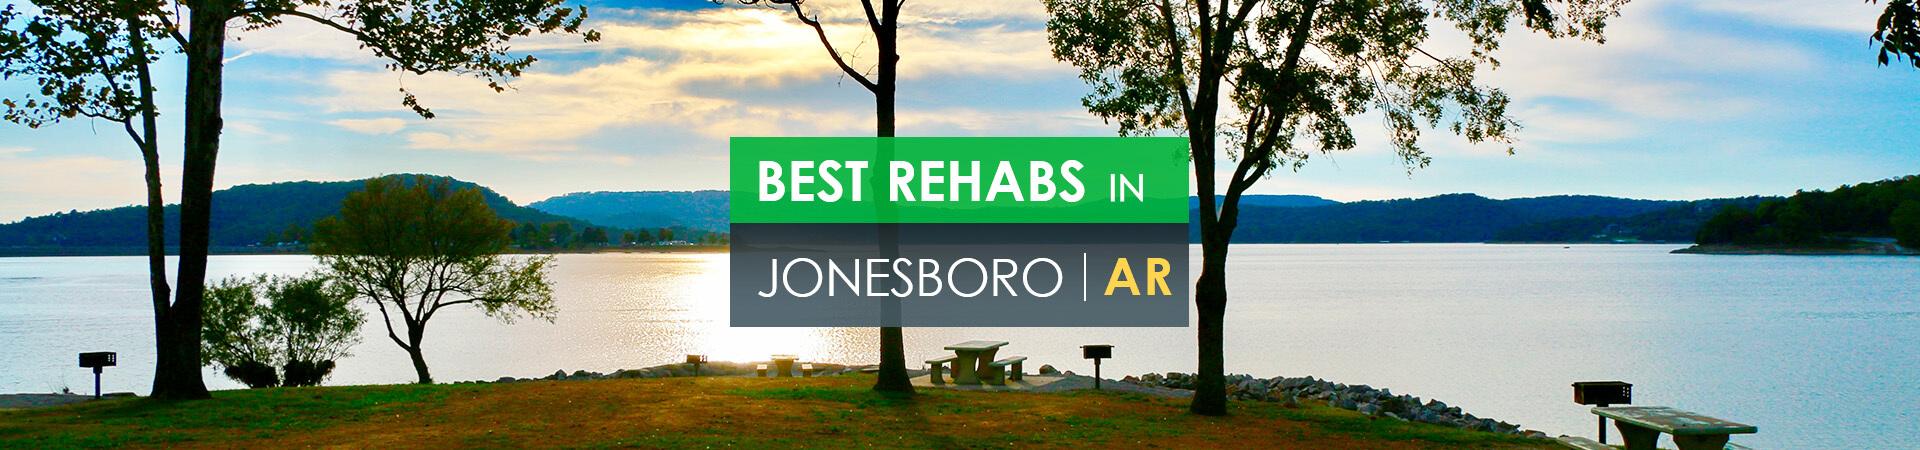 Best rehabs in Jonesboro, AR